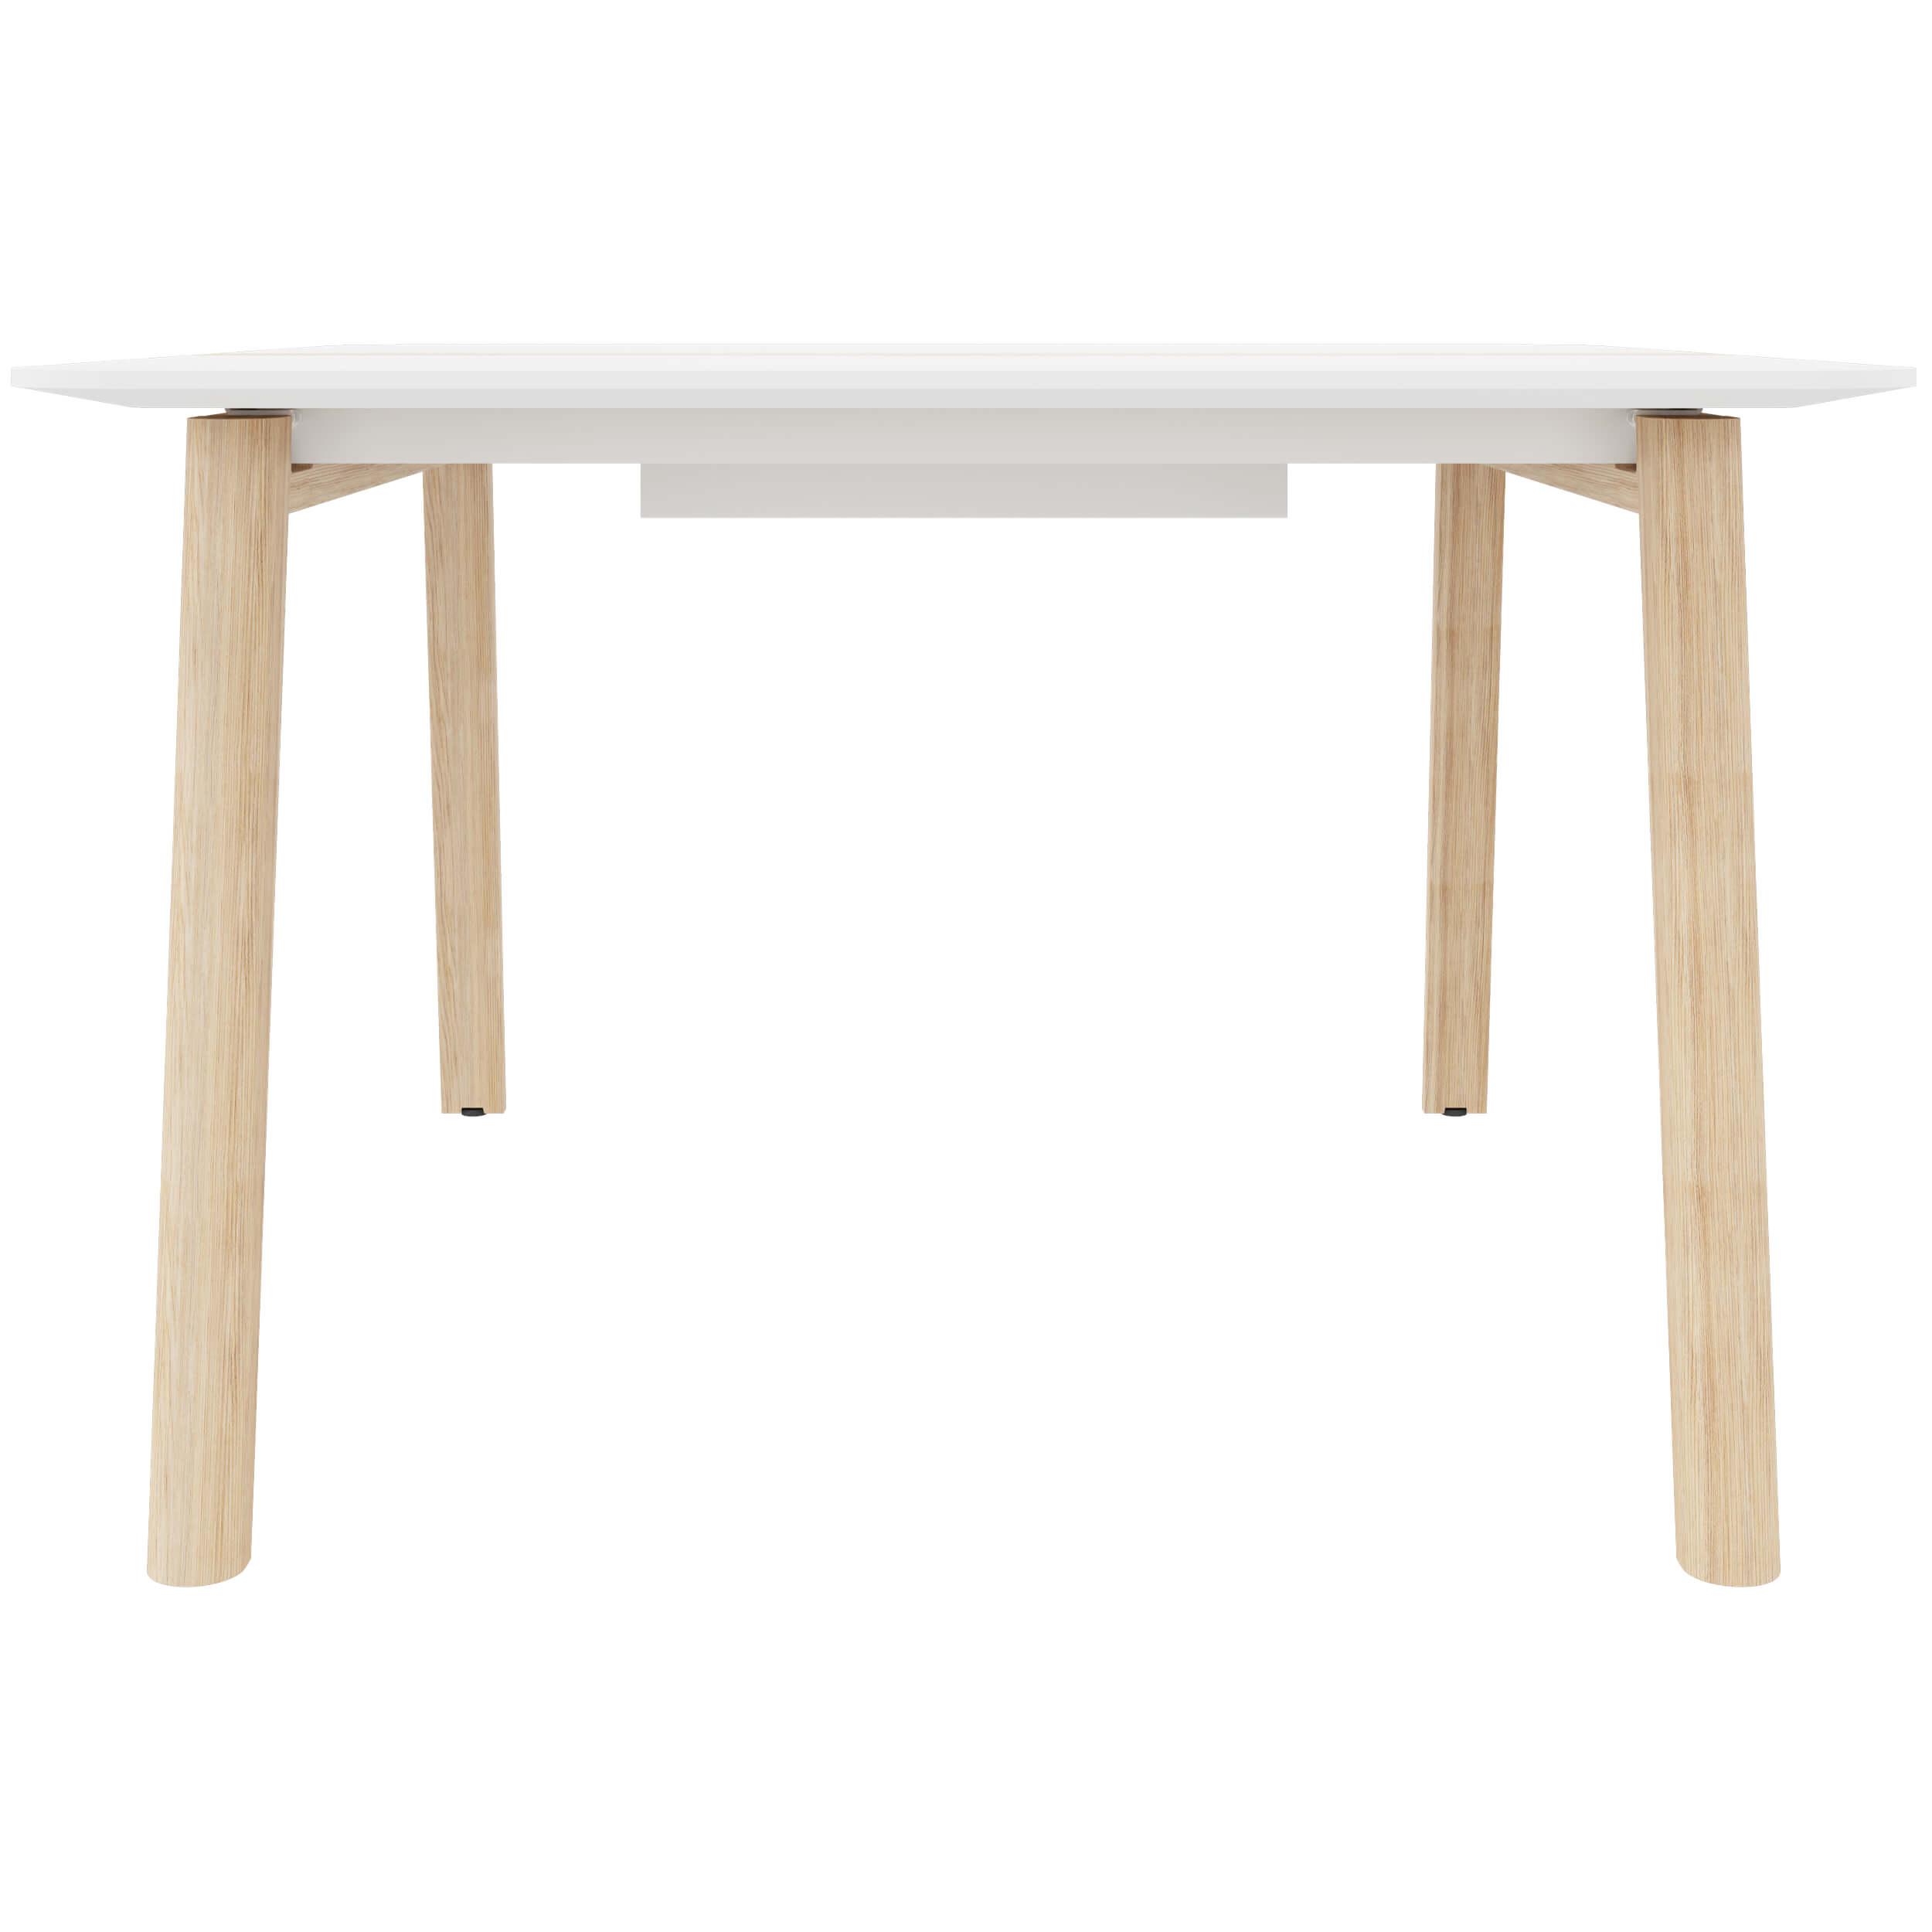 Konferenztisch NOVA Wood HPL 120 x 120 cm mit Kabeldurchlass Weiß/Holz Meeting Bürotisch